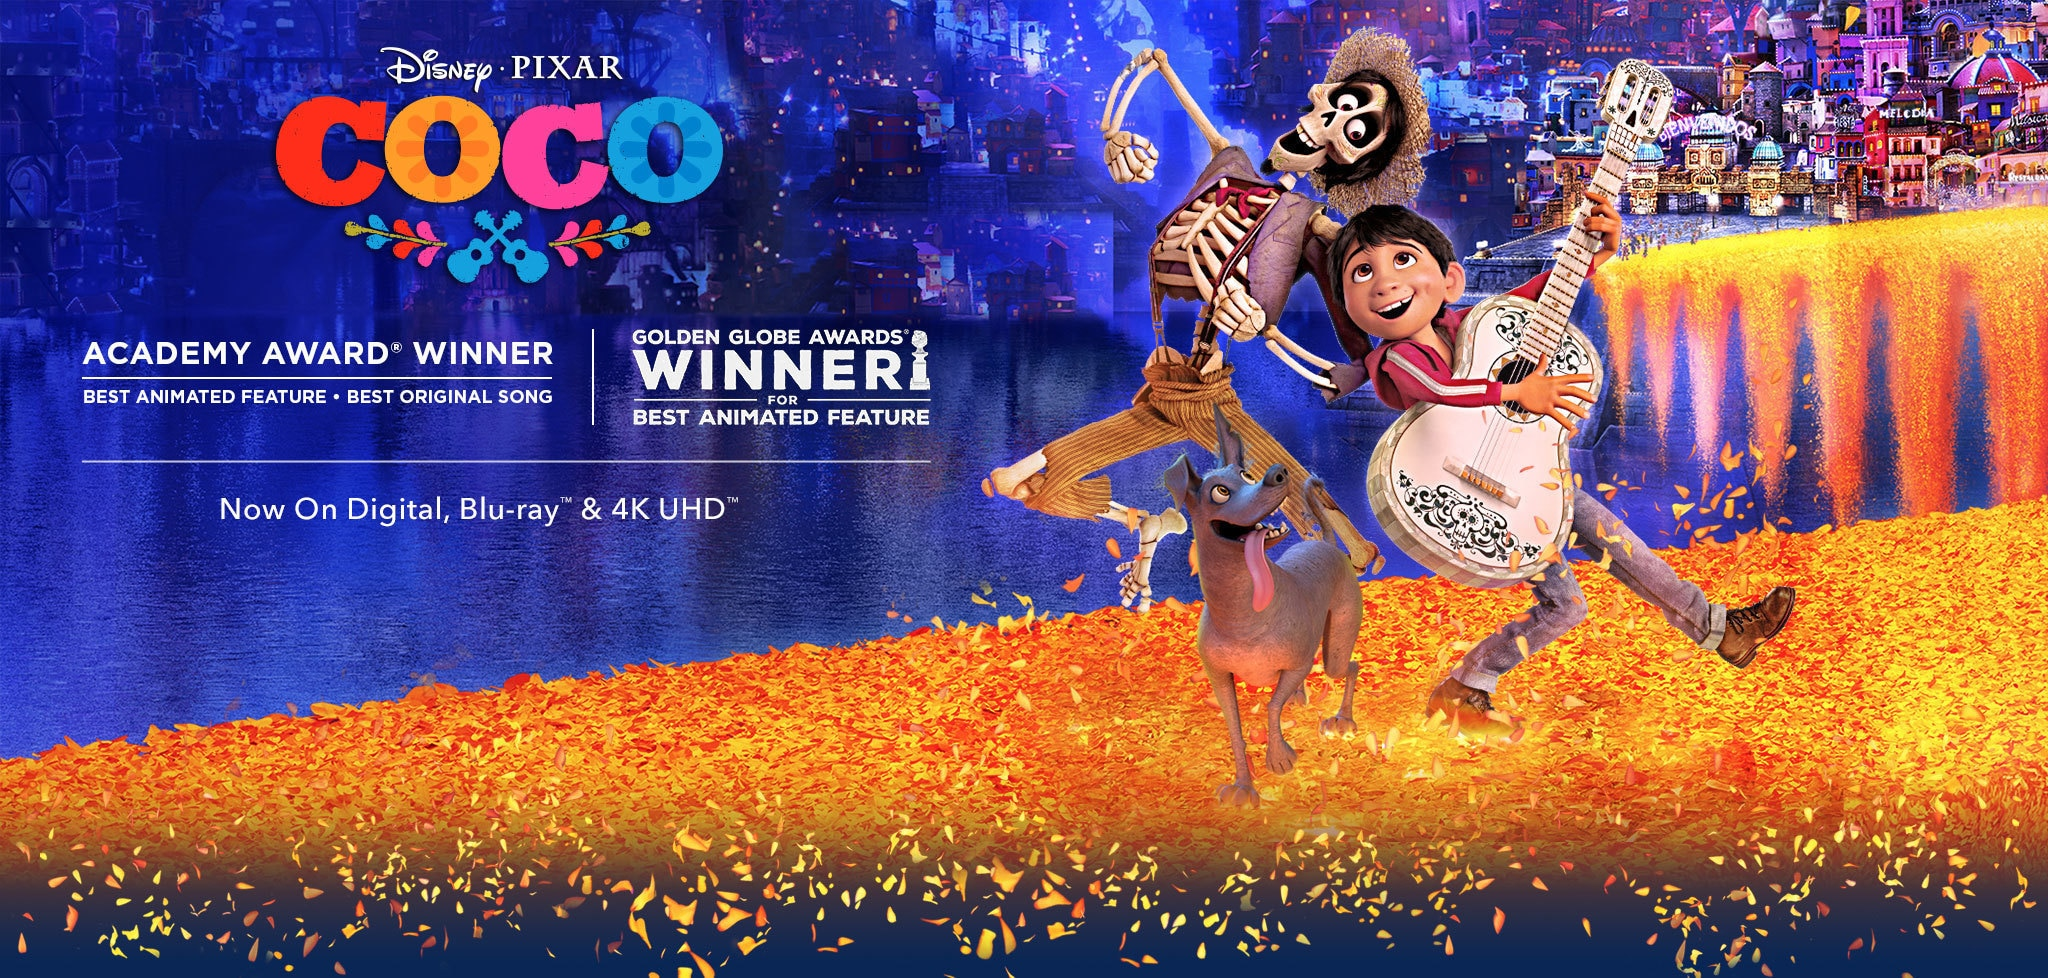 Disney Pixar Coco Now On Blu Ray And Digital New On K Uhd